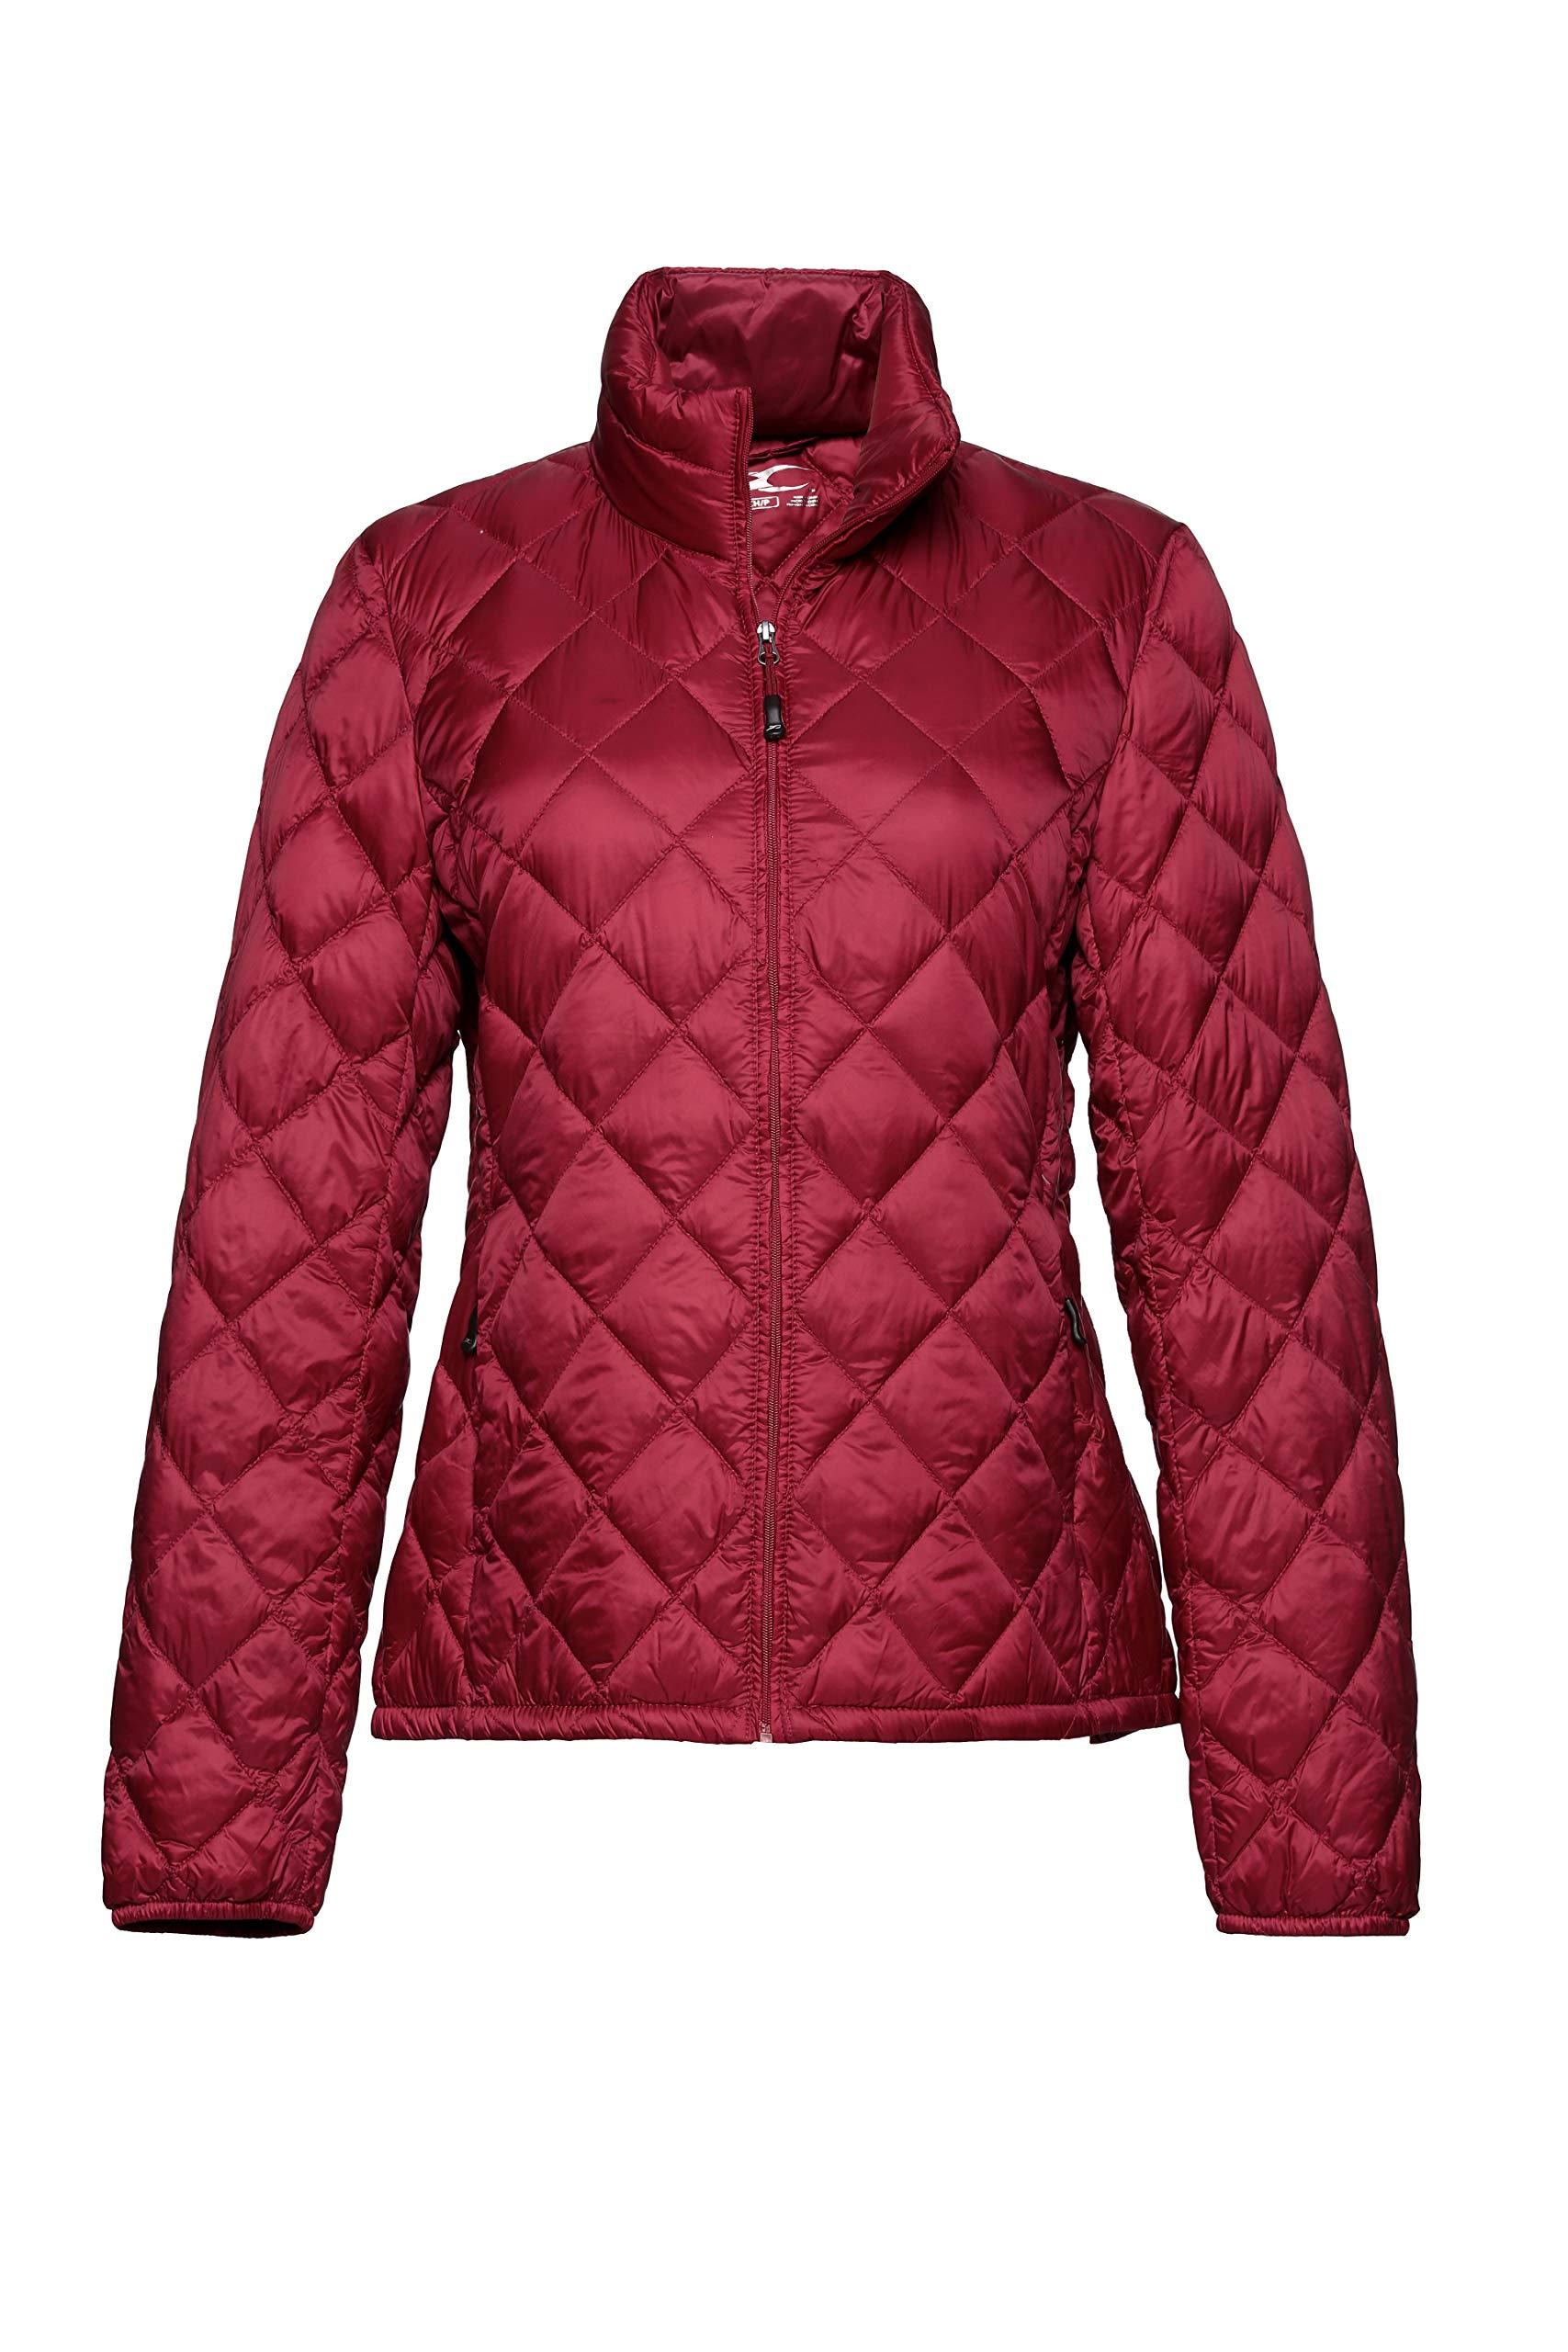 XPOSURZONE Women Packable Down Jacket Lightweight Puffer Coat True Red XL